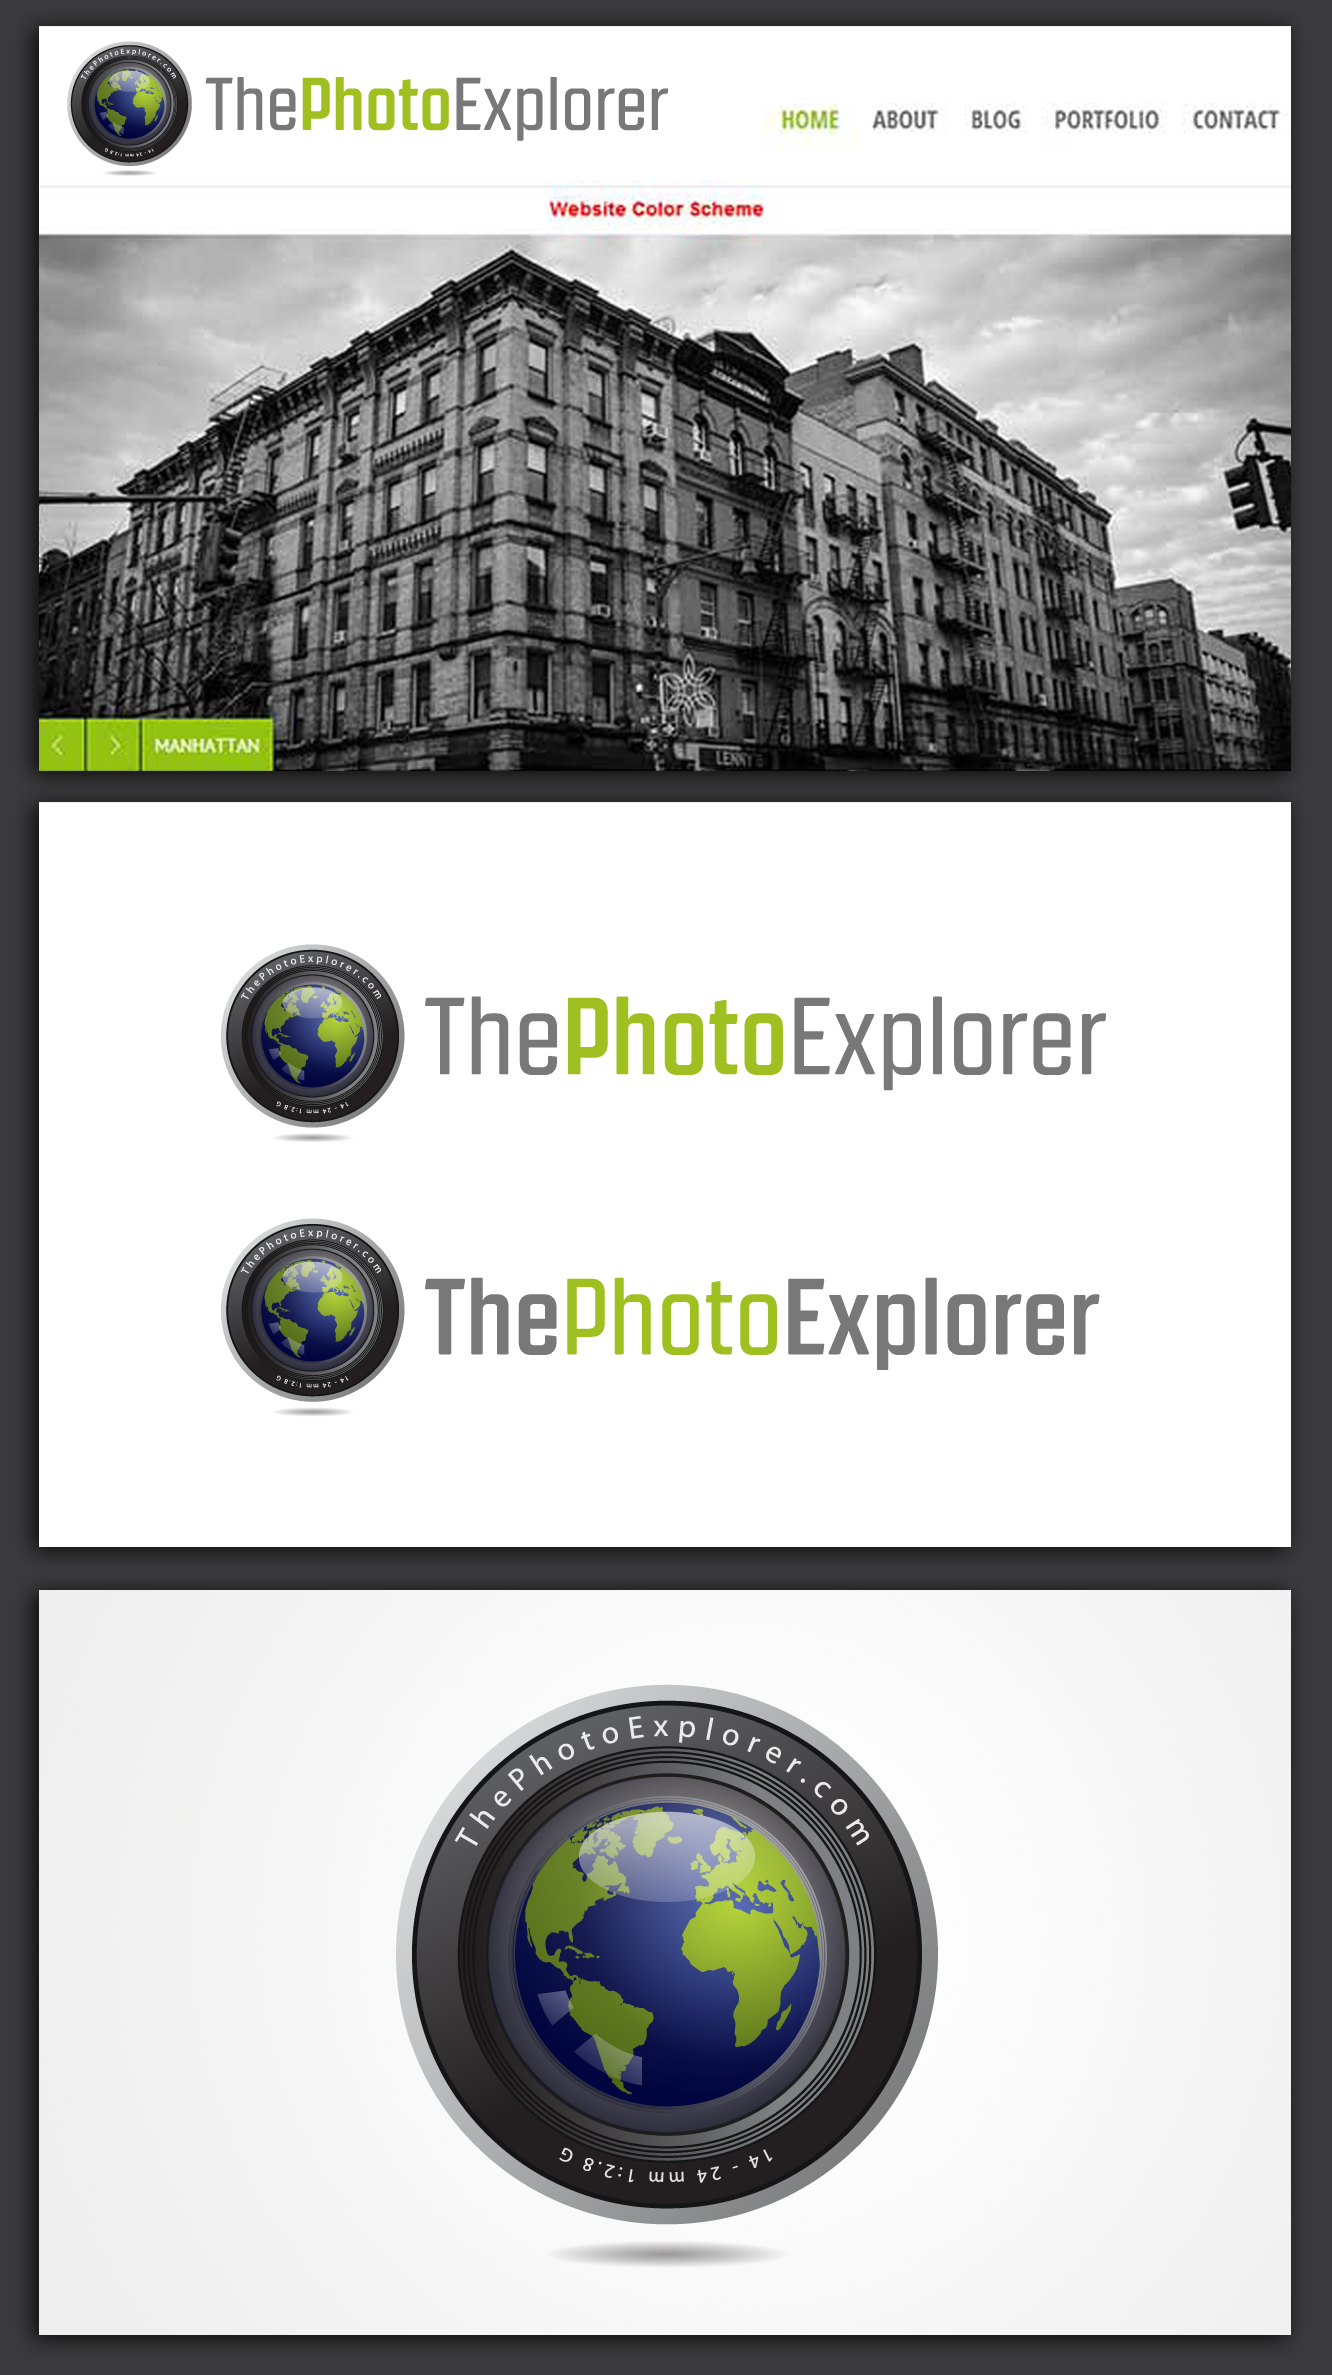 Create the next logo for ThePhotoExplorer